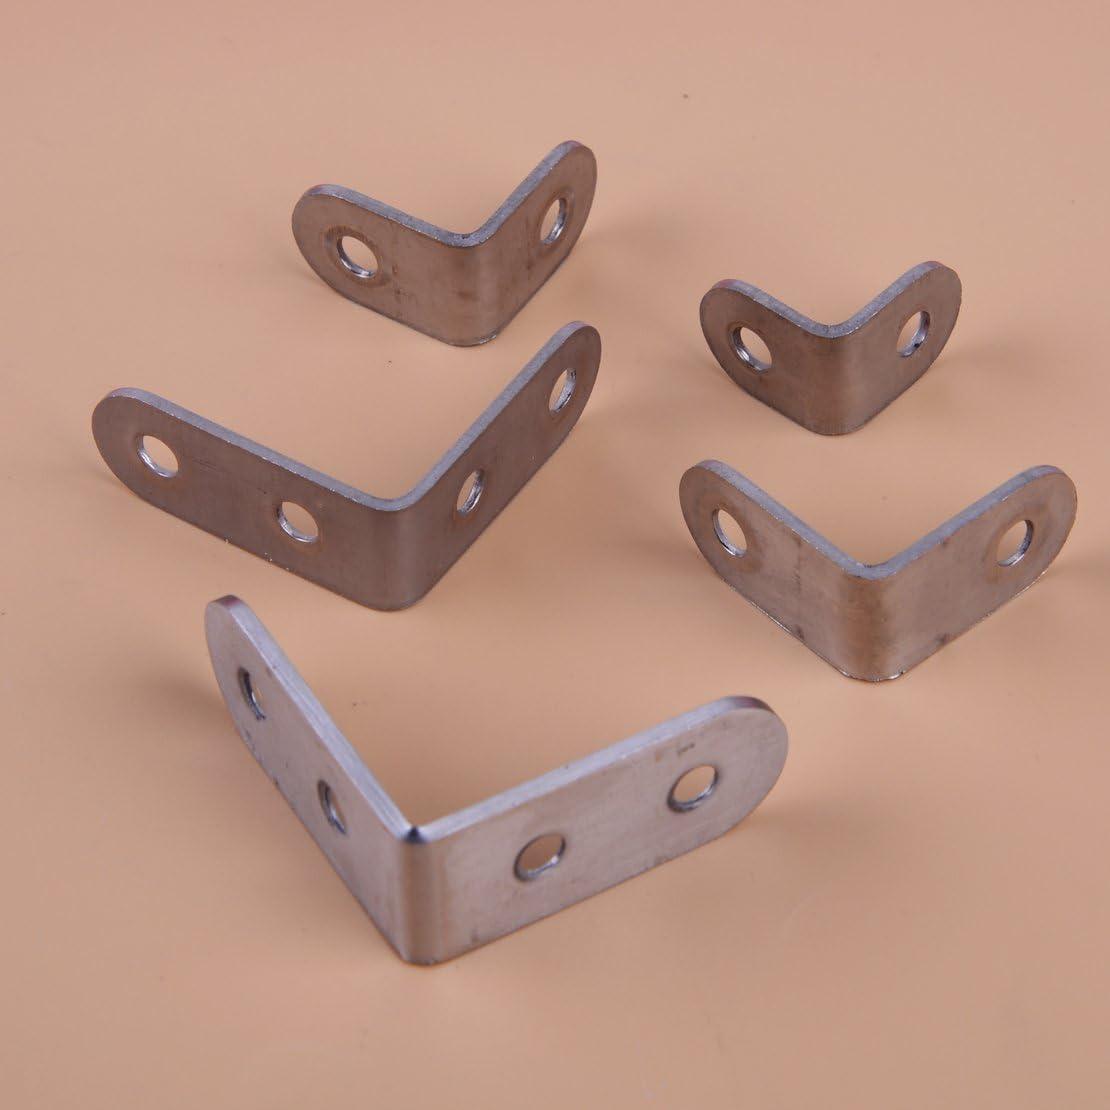 10 St/ück 2,5x2,5cm Edelstahl L-Form 90 Grad Winkel Winkel Eckverbinder f/ür Bodentr/äger